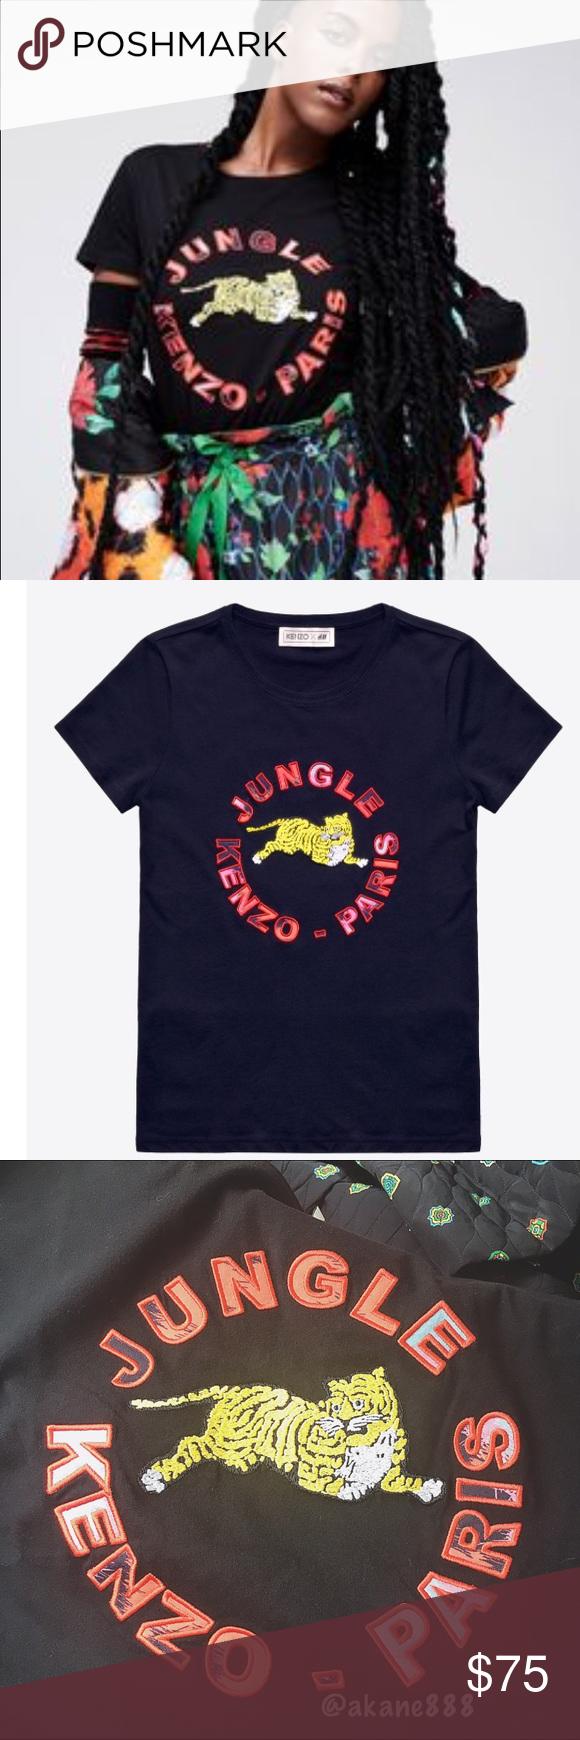 3b785368 Kenzo x H&M T-Shirt Brand new with tag Kenzo x H&M T-shirt in black ...